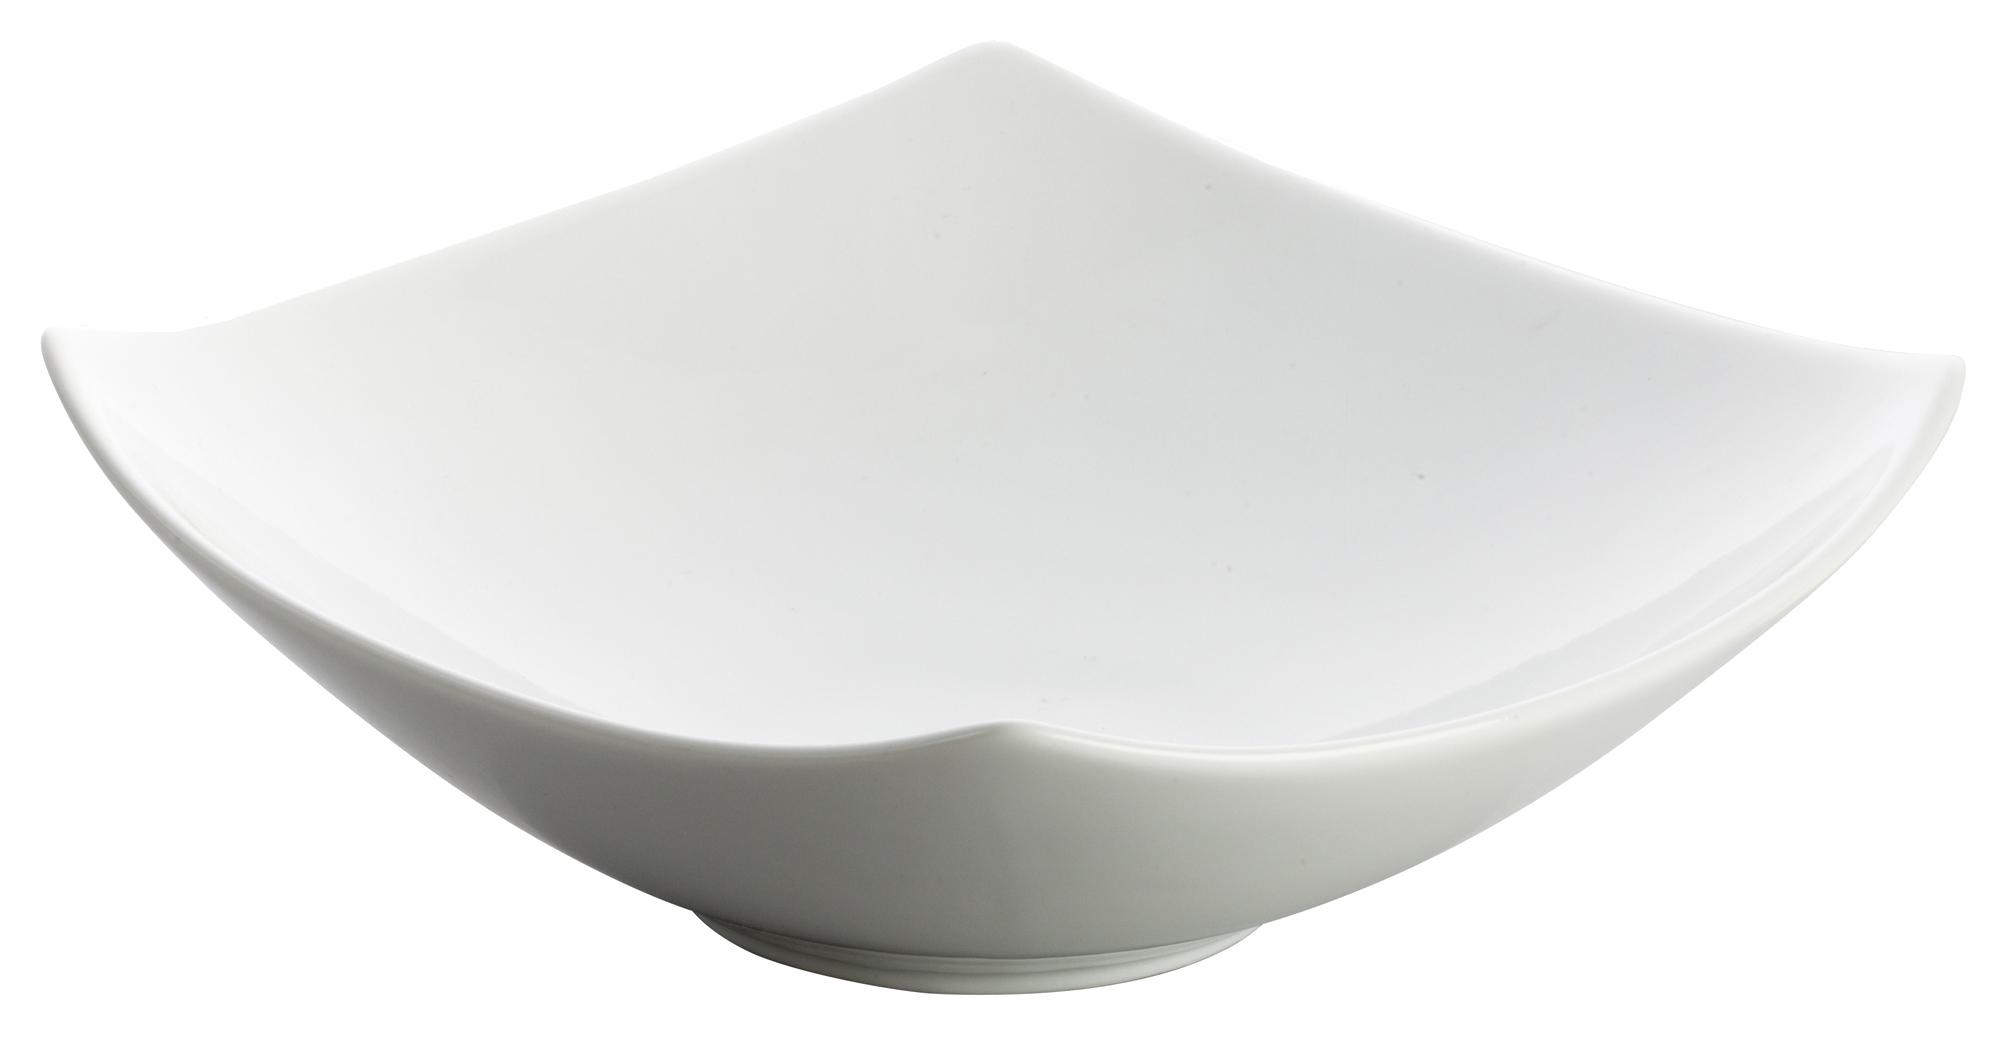 Winco WDP013-102 plate, china